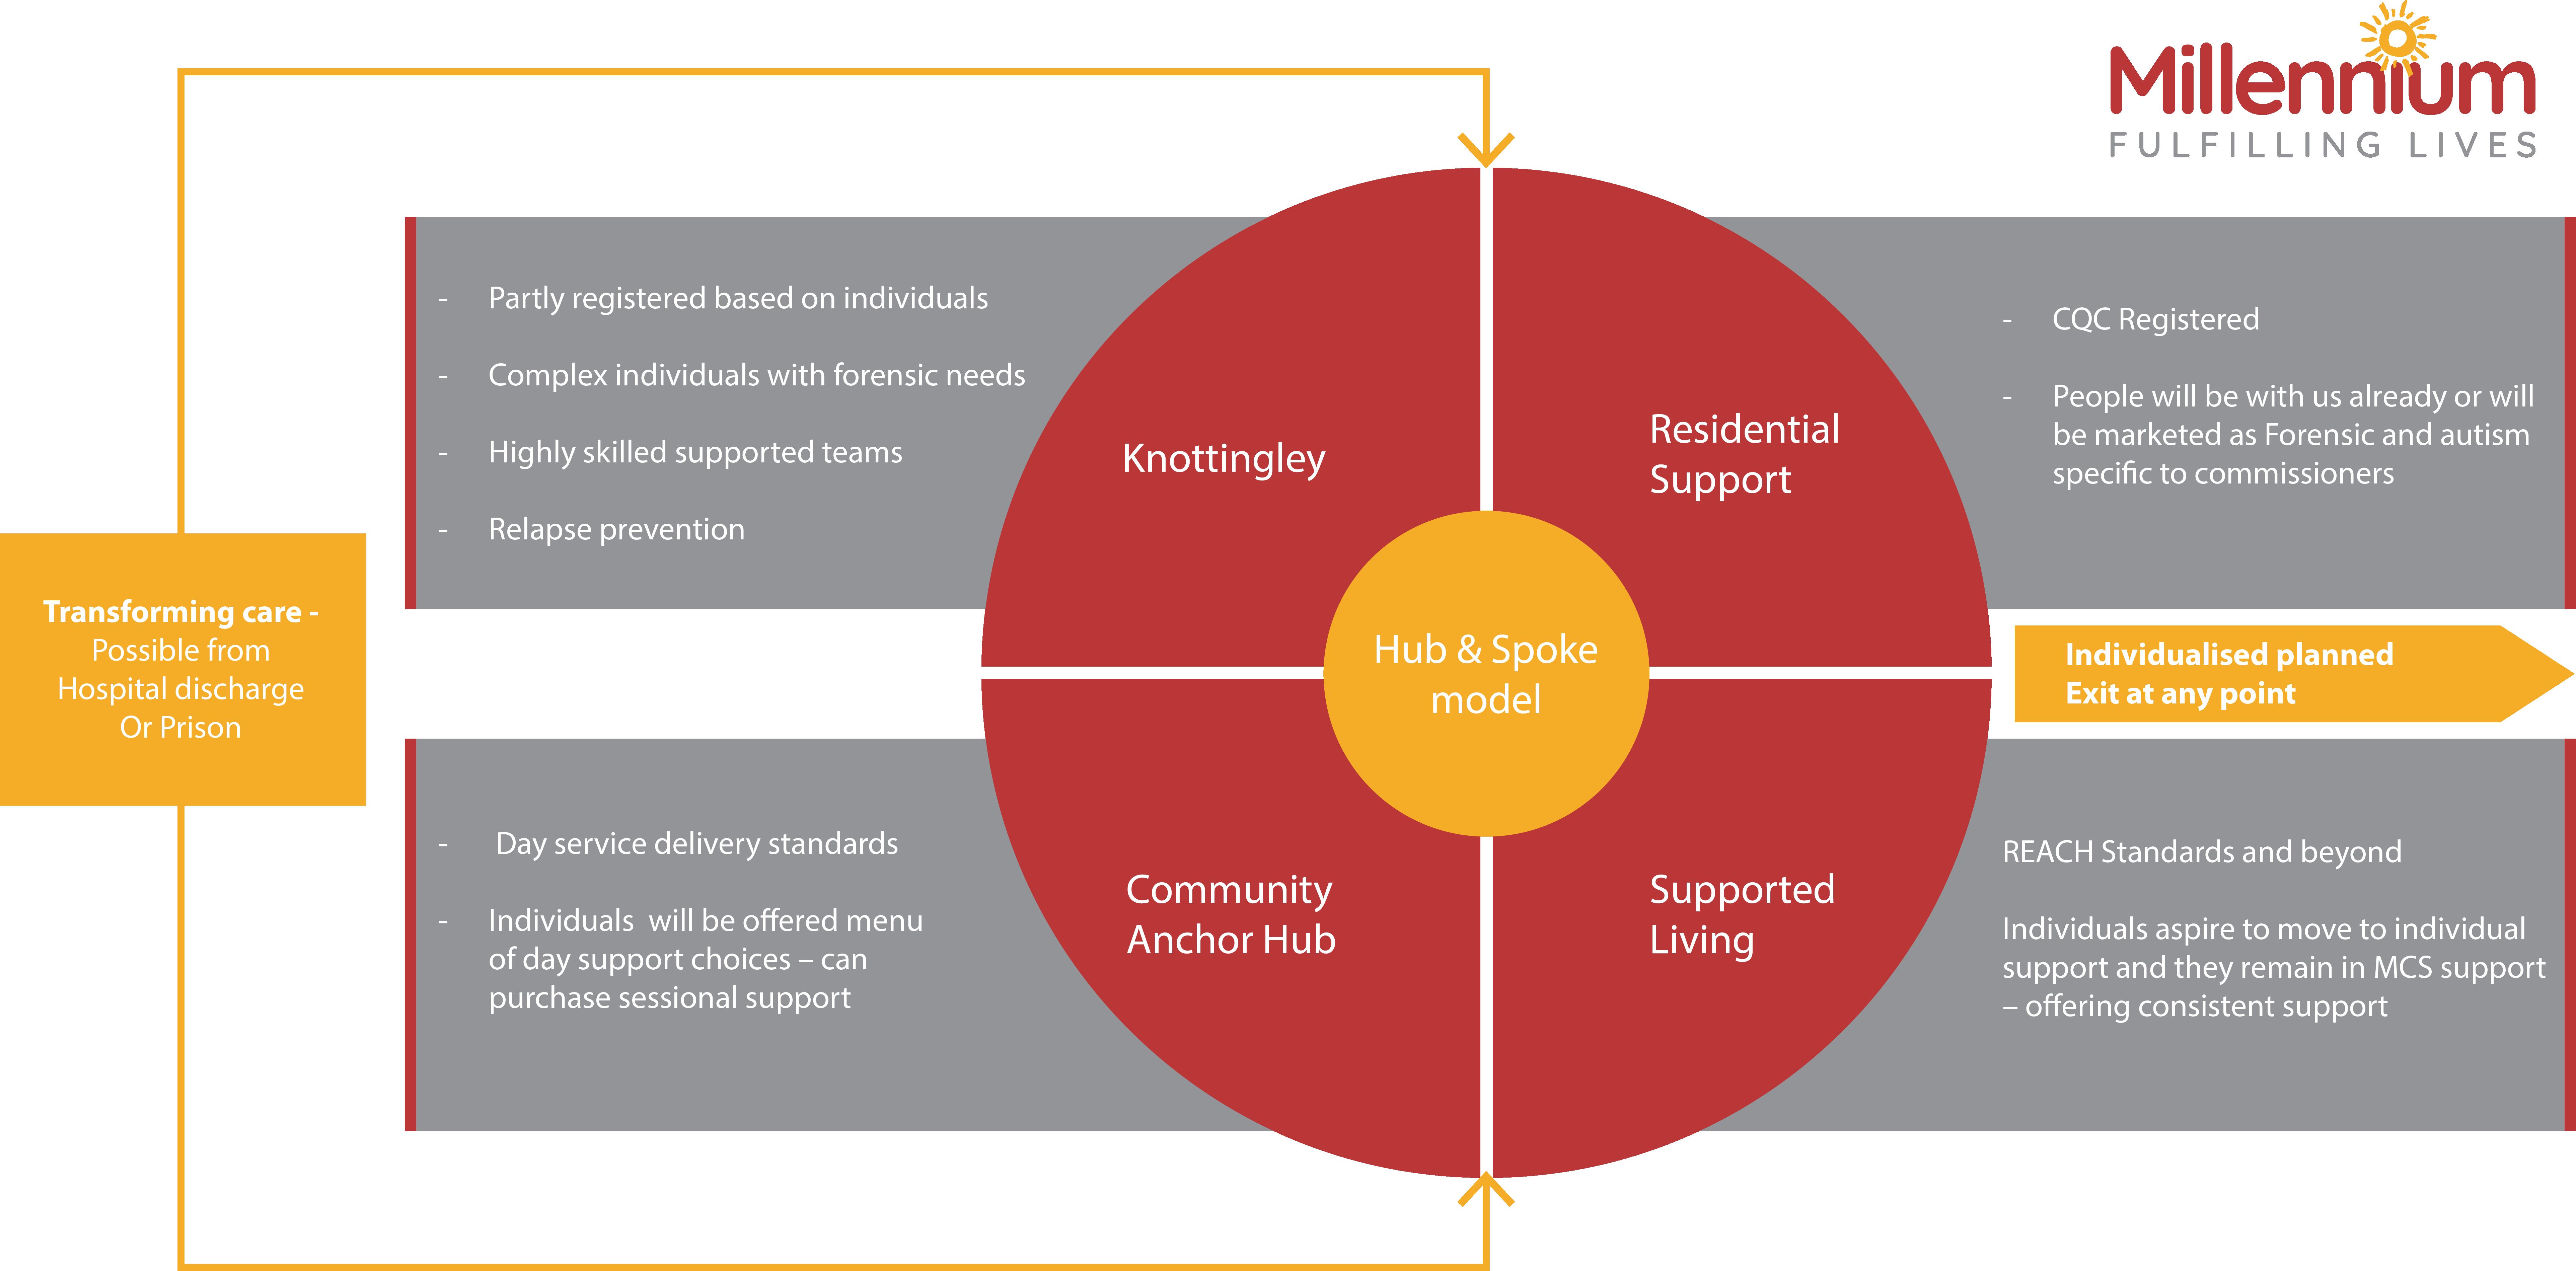 Millennium - Support Model